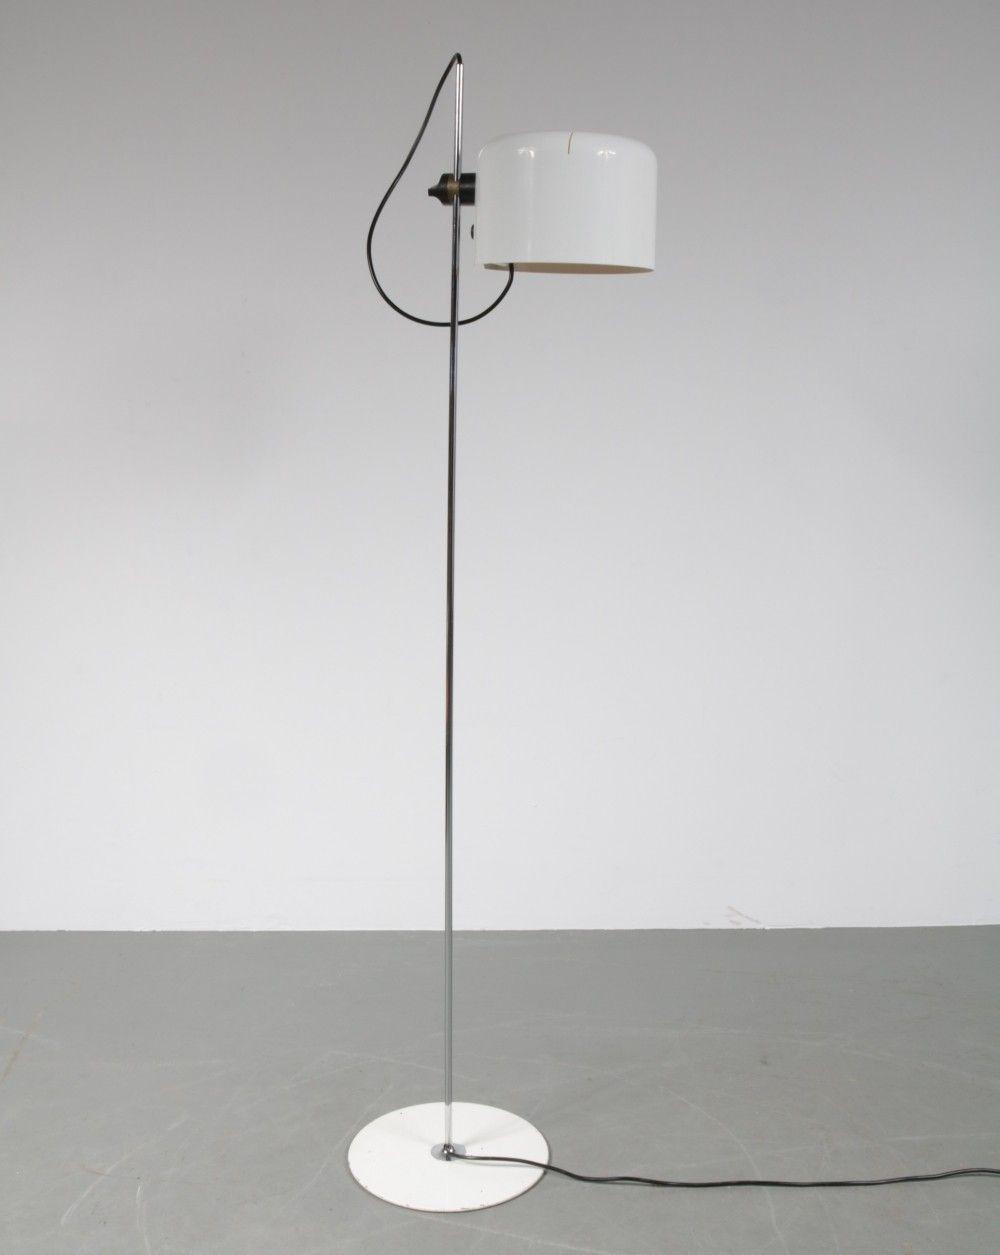 Floor lamp by Joe Colombo for Oluce, 1960s | Lamp, Floor